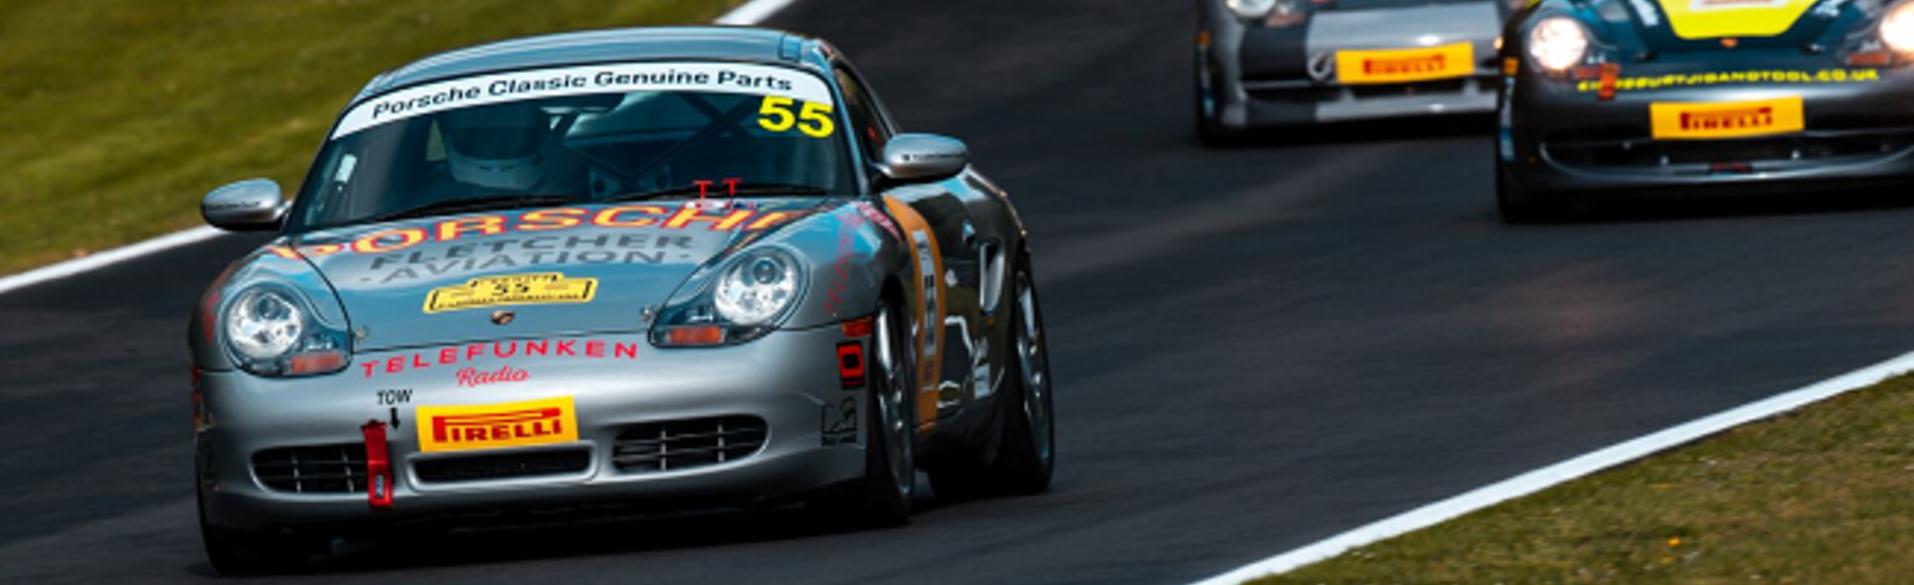 Porsche Cardiff Boxster Cup Advert 2